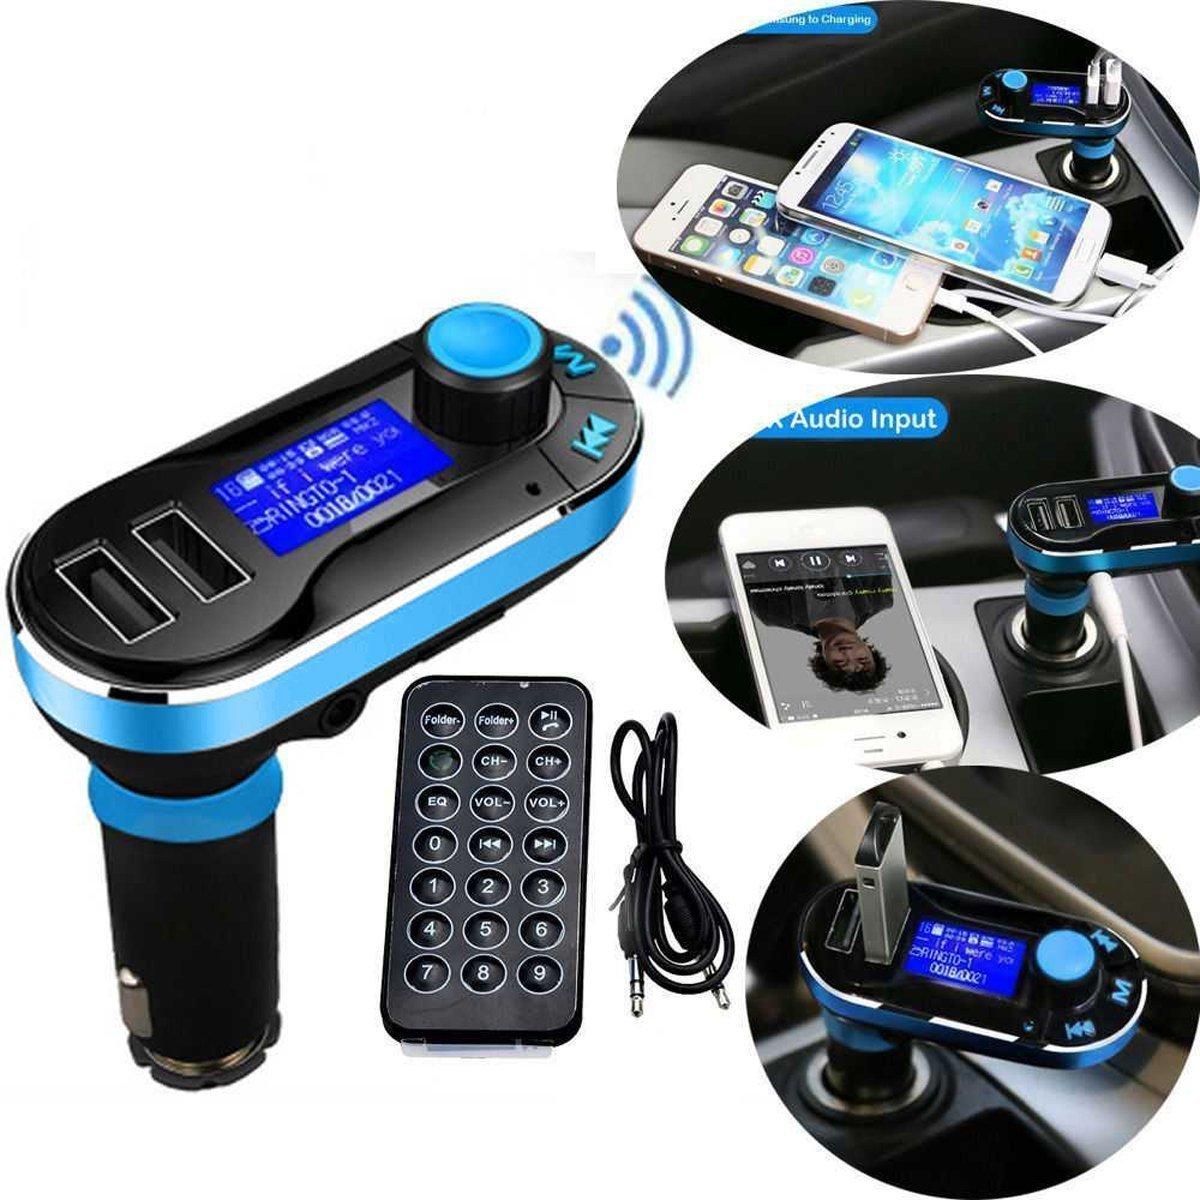 FusionTech/® Transmisor FM Bluetooth con control remoto Manos Libres 2 Puerto USB Cargador de M/úsica MP3 Coche Kit con Interruptor de Pantalla Soporte Entrada para M/óviles,Tablet Salida AUX